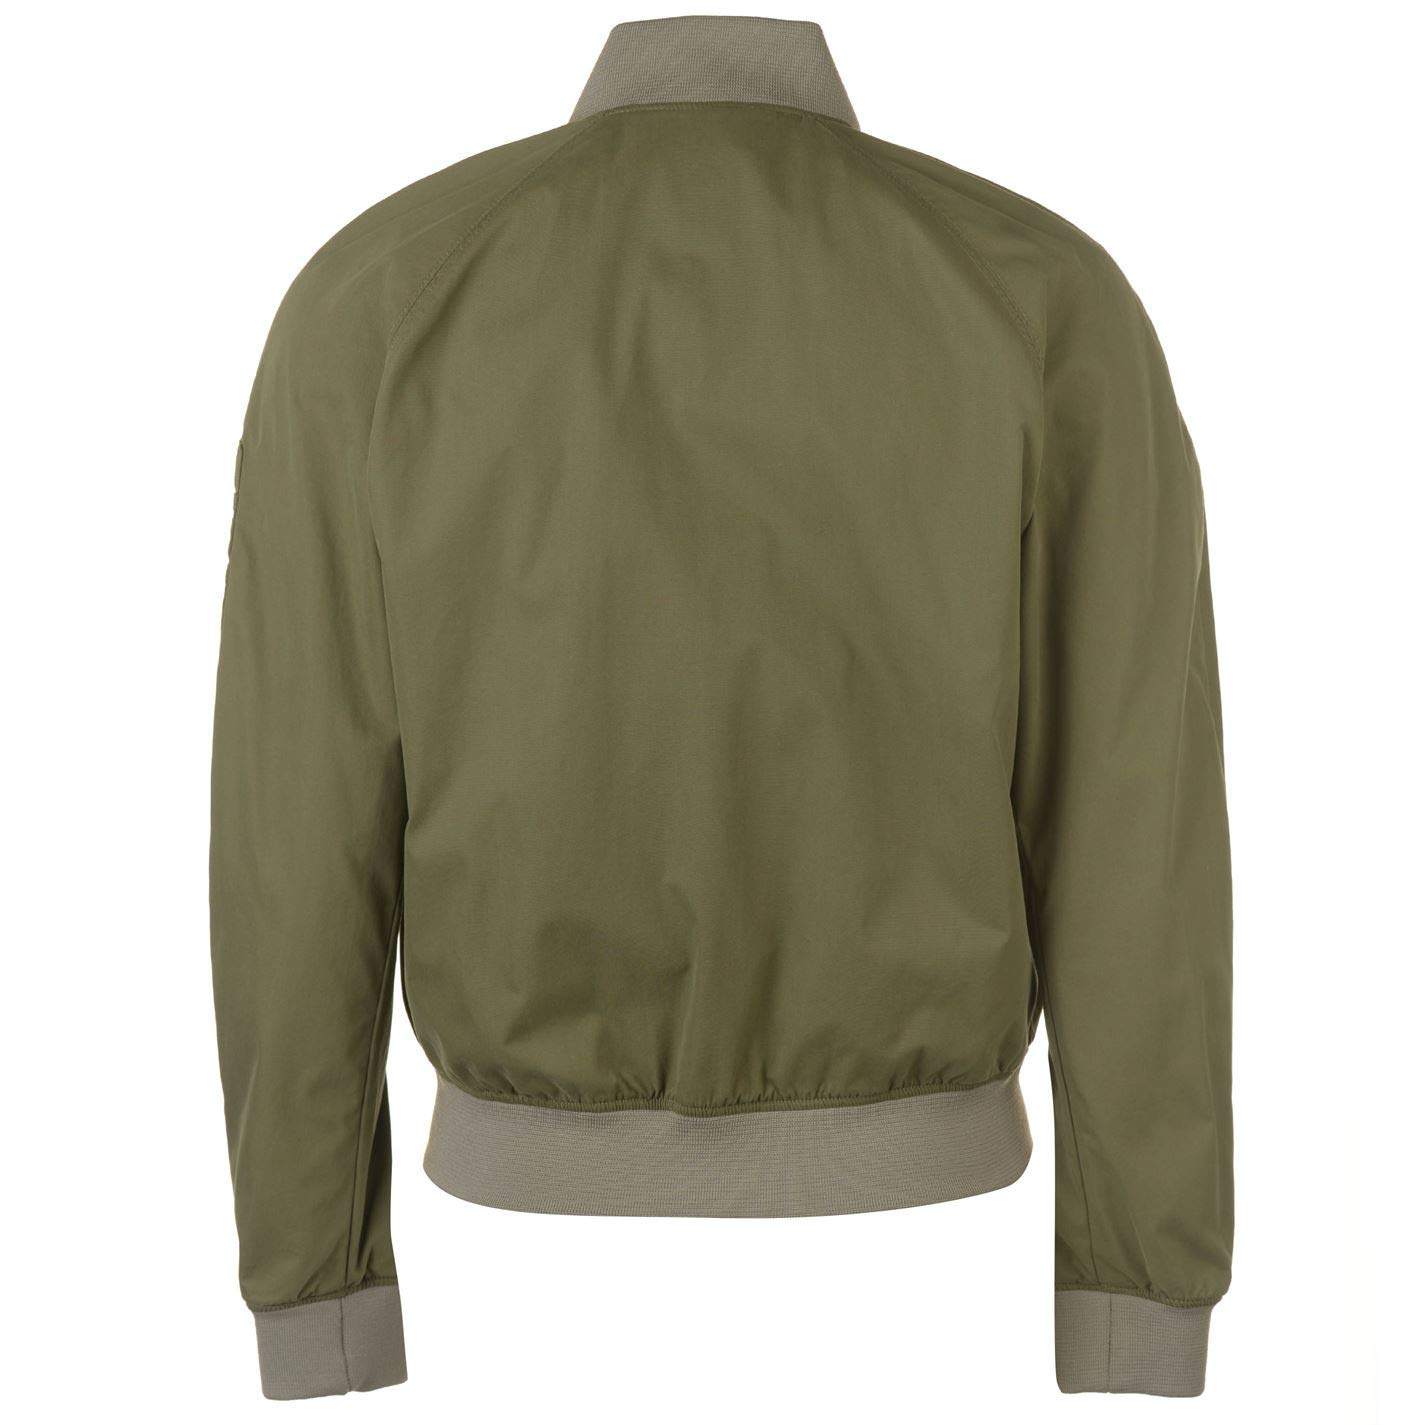 a561f1237 Amazon.com: G-Star Raw Men's Attacc Bomber Jacket: Clothing